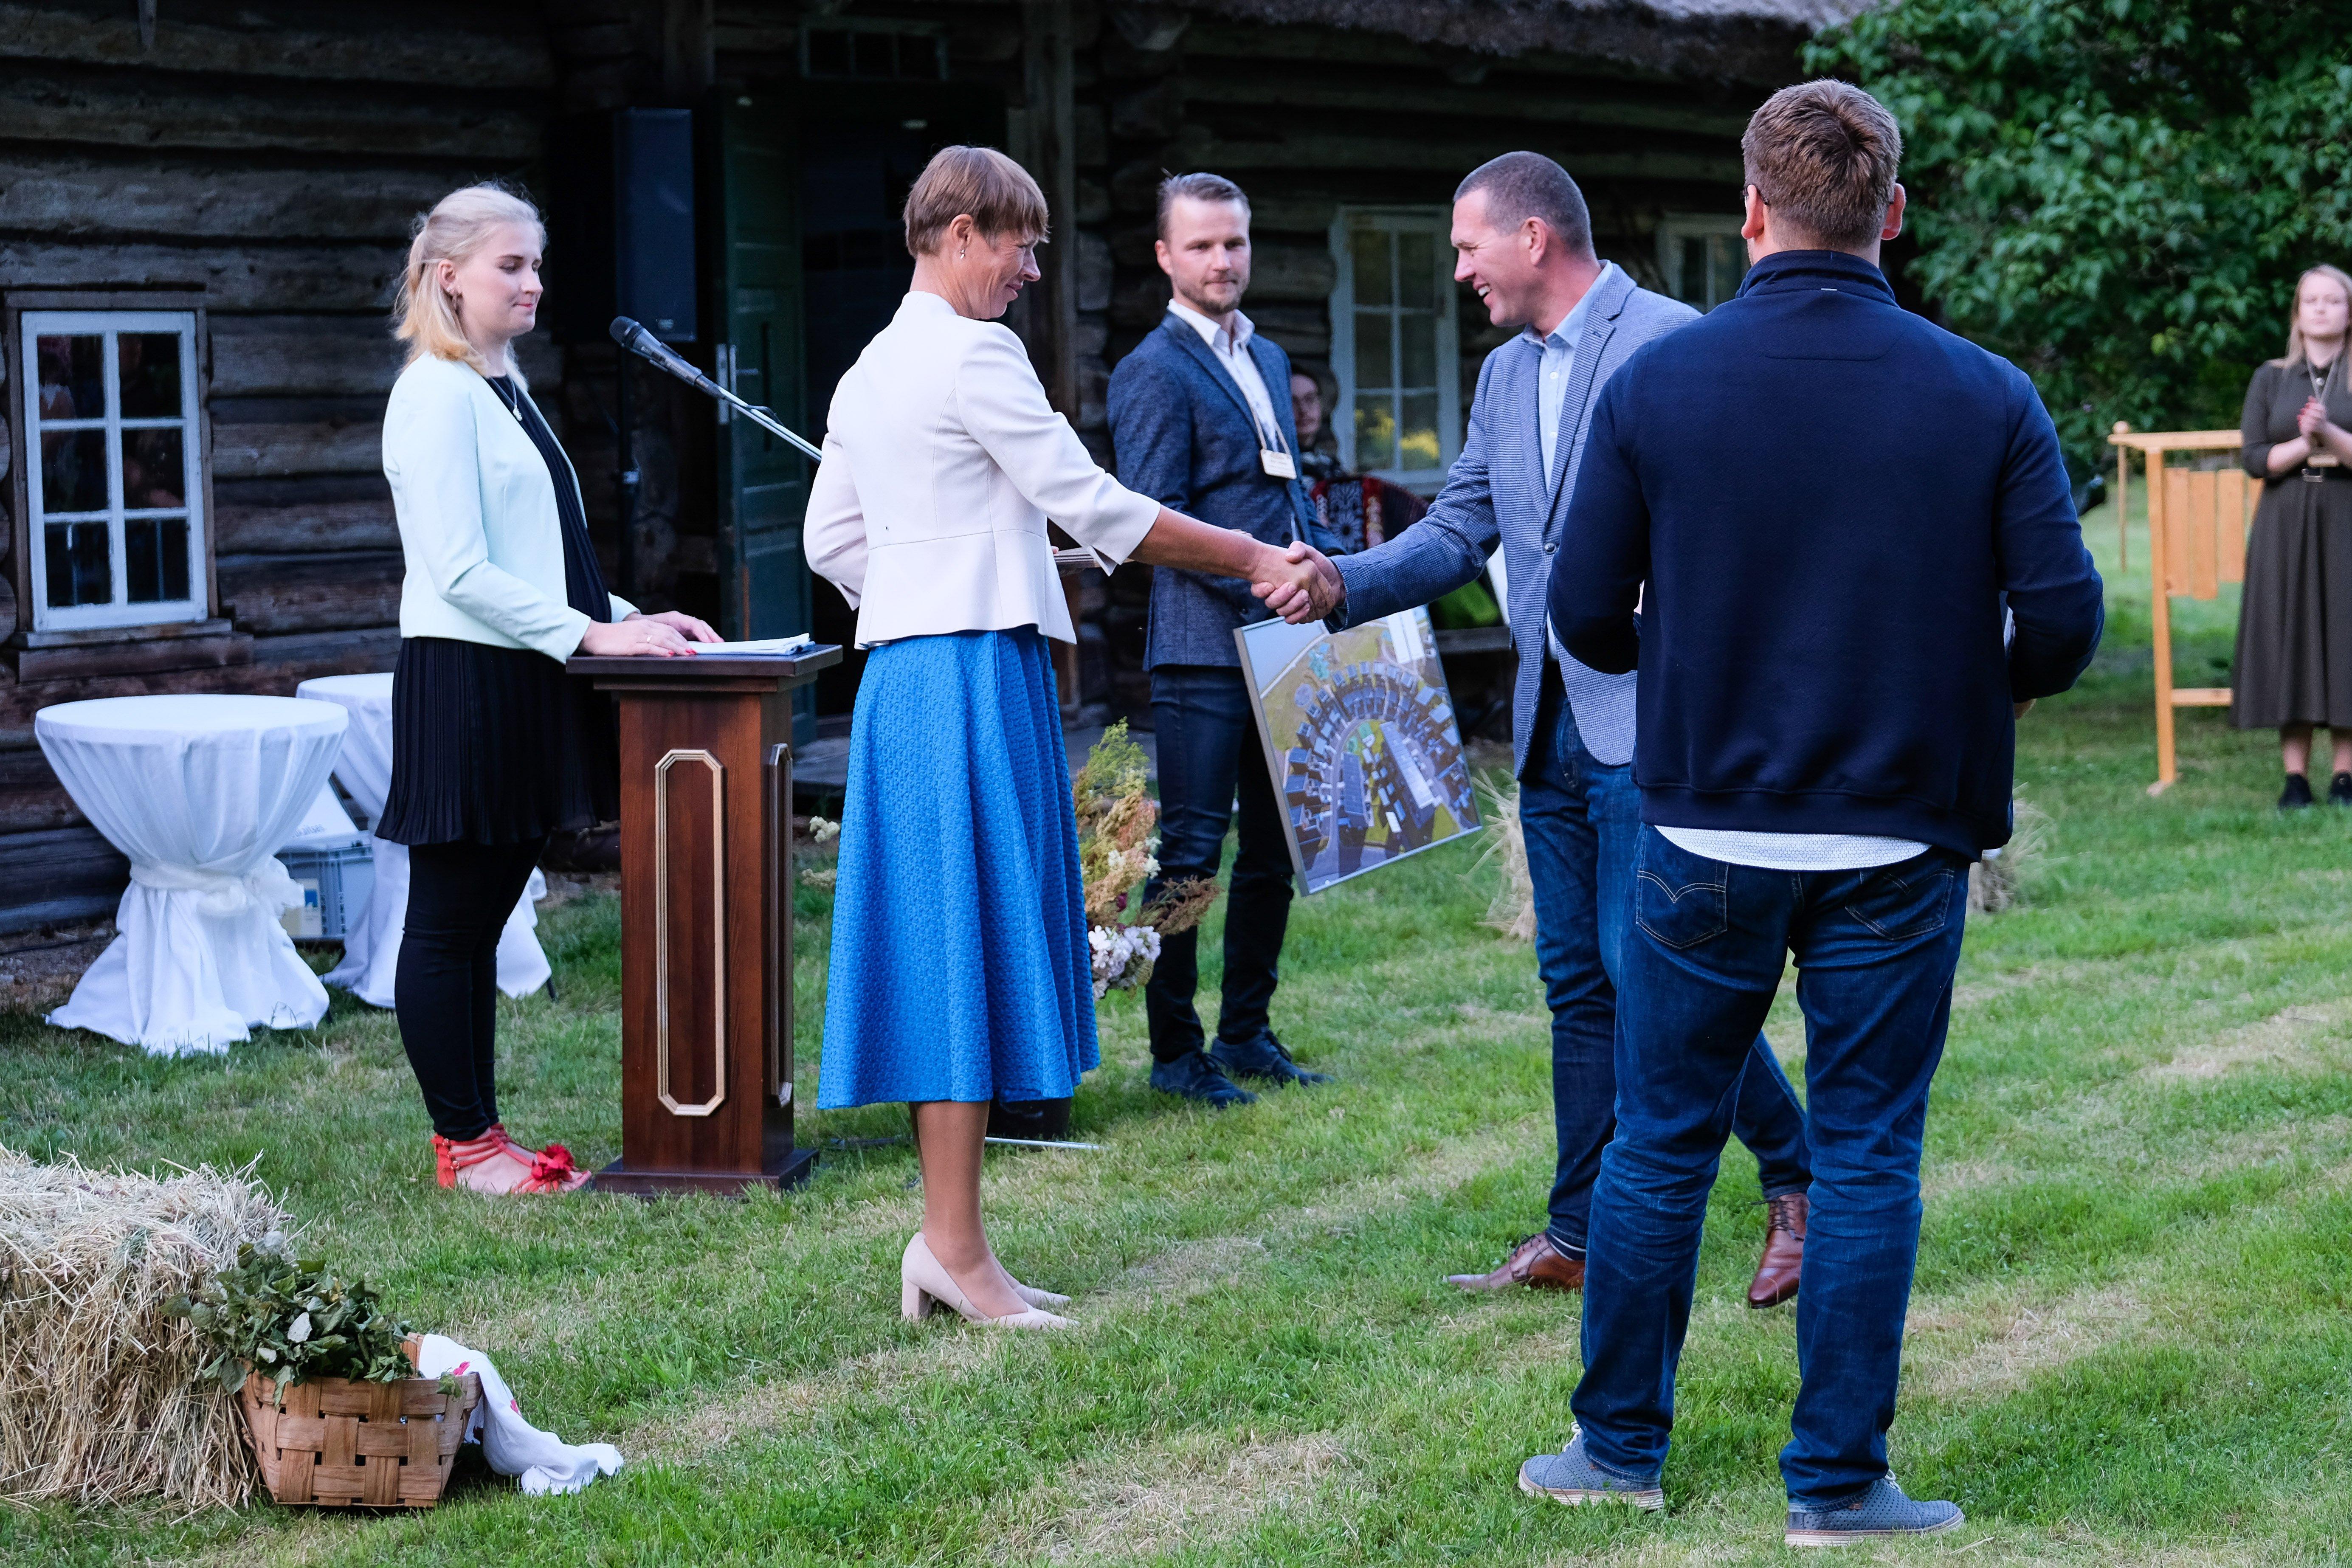 Kersti Kaljulaid overrekker pris til Arca Nova